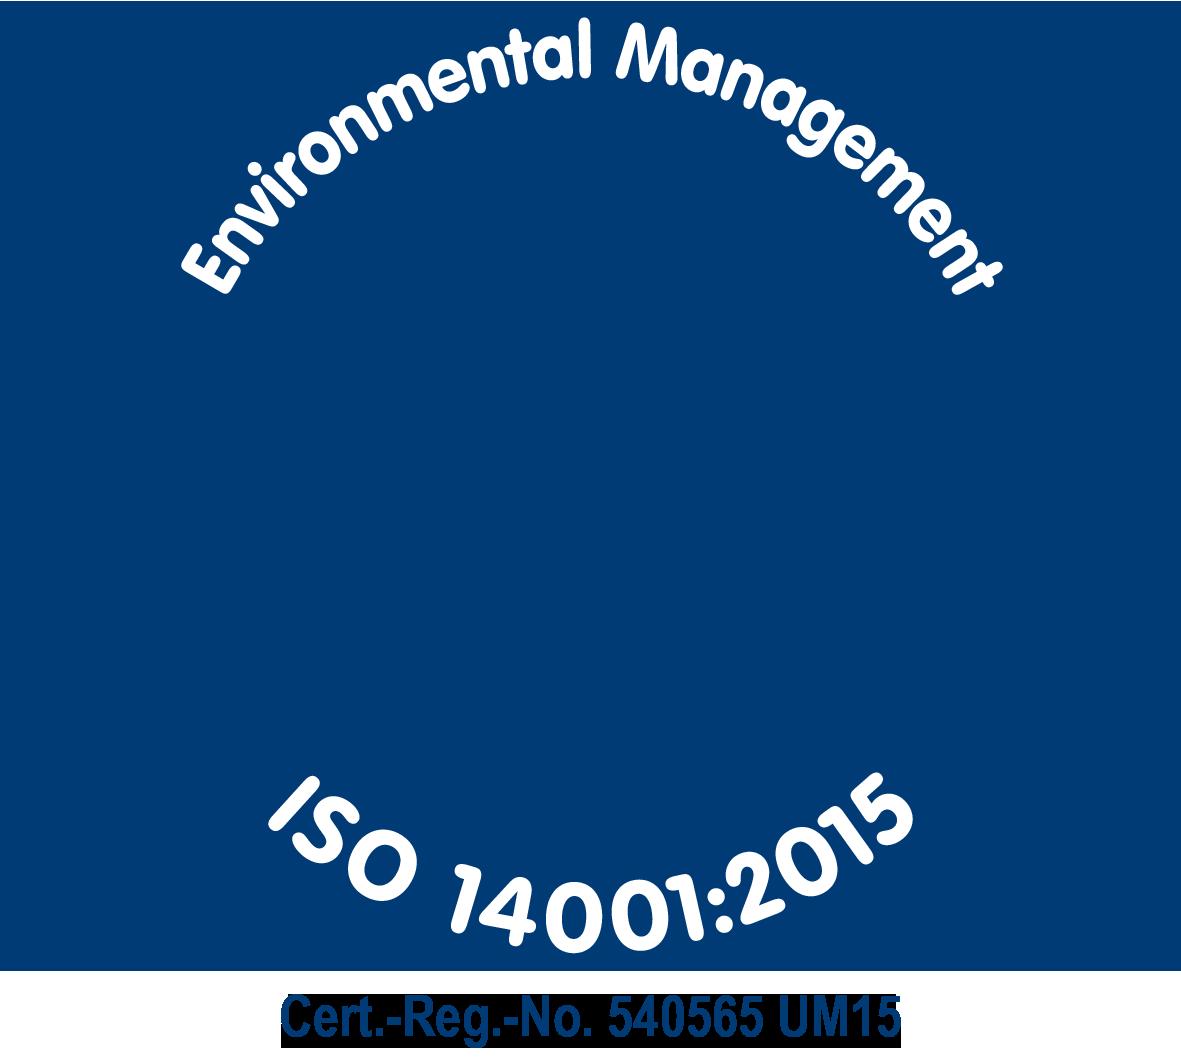 Zertifizierung DIN ISO14001:2015 - bluechemGROUP